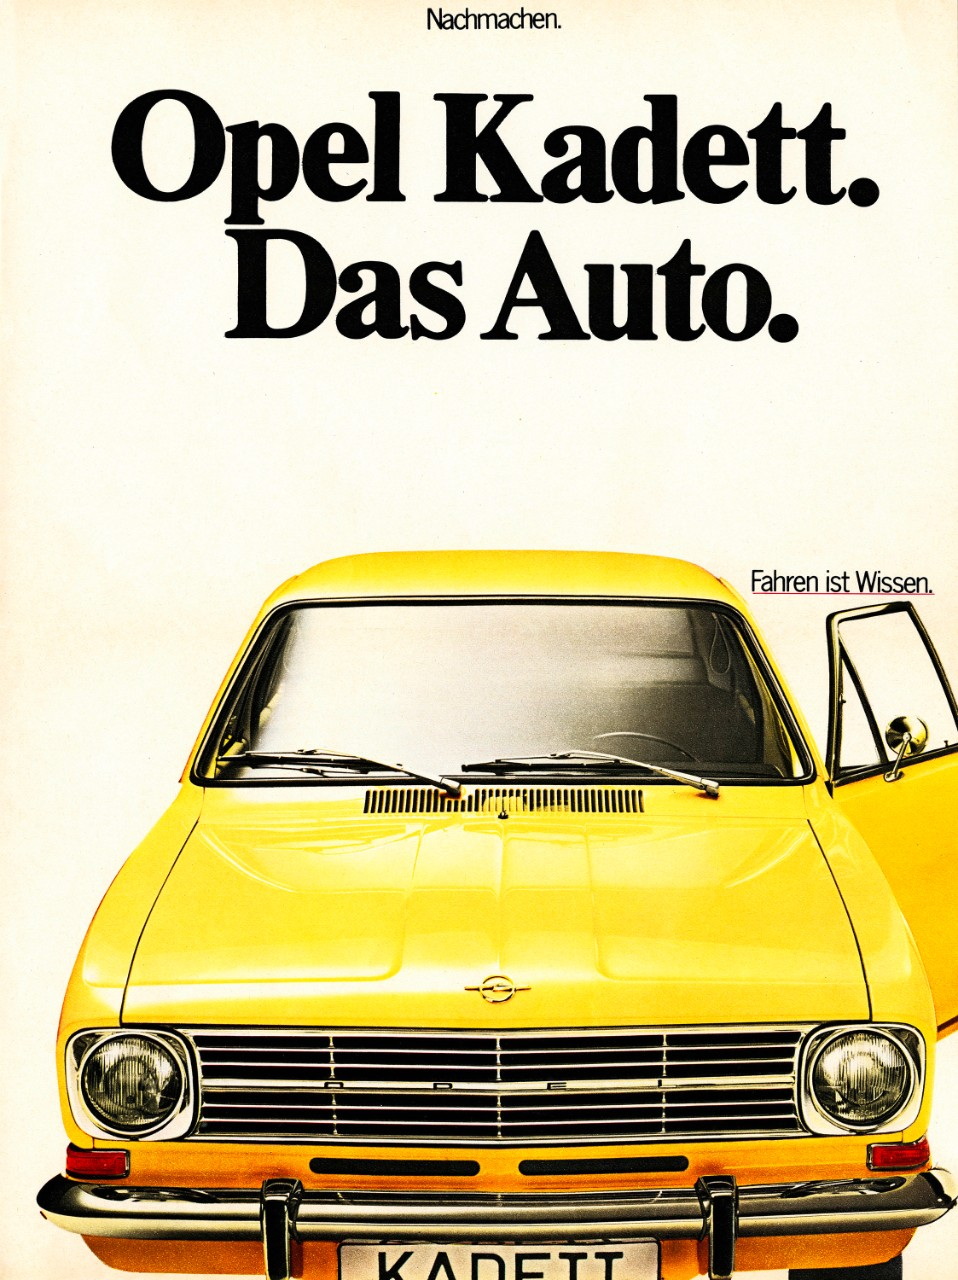 cq5dam.web .1280.1280252892529 Το Kadett B γιόρτασε τα 50 Χρόνια του Opel, Opel Kadett, Opel Kadett B, Opel Kadett. Das Auto